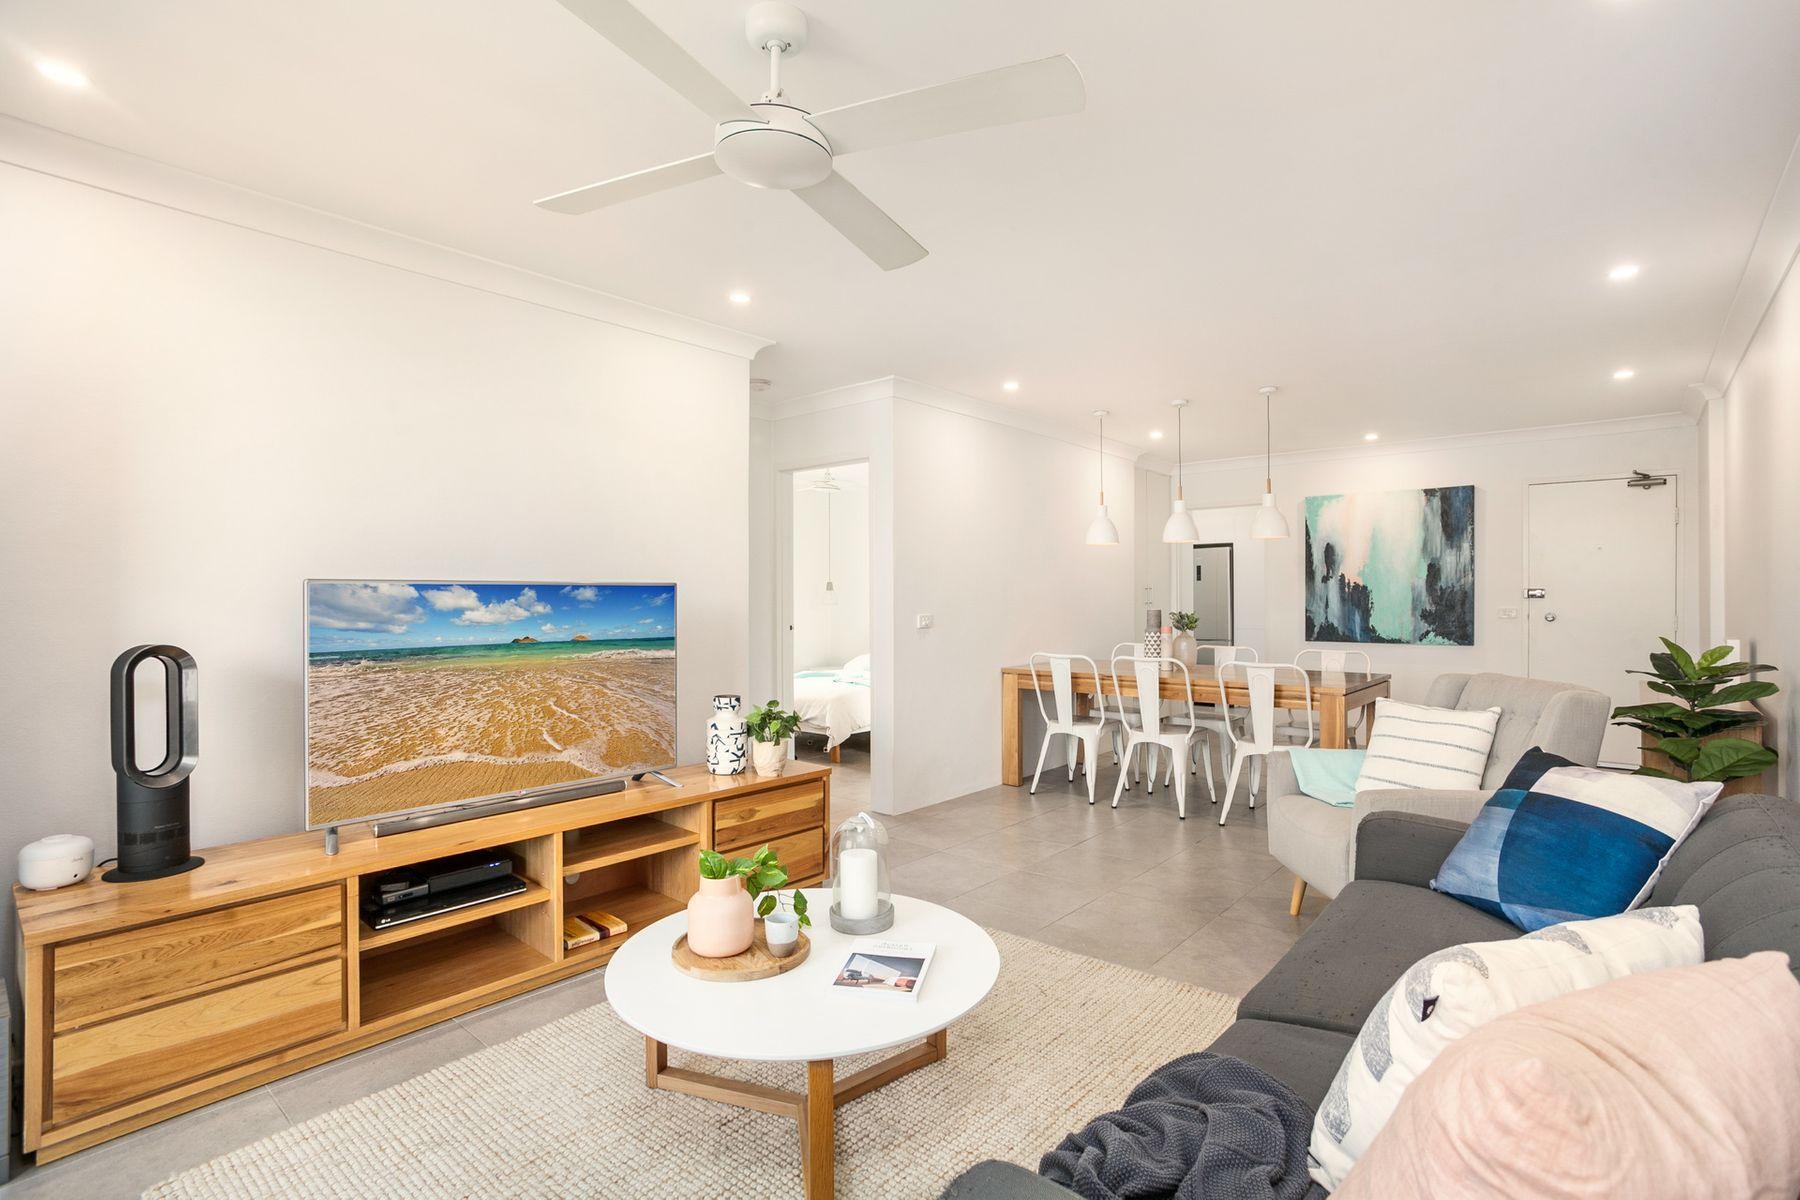 14/56 Keira Street, Wollongong, NSW 2500